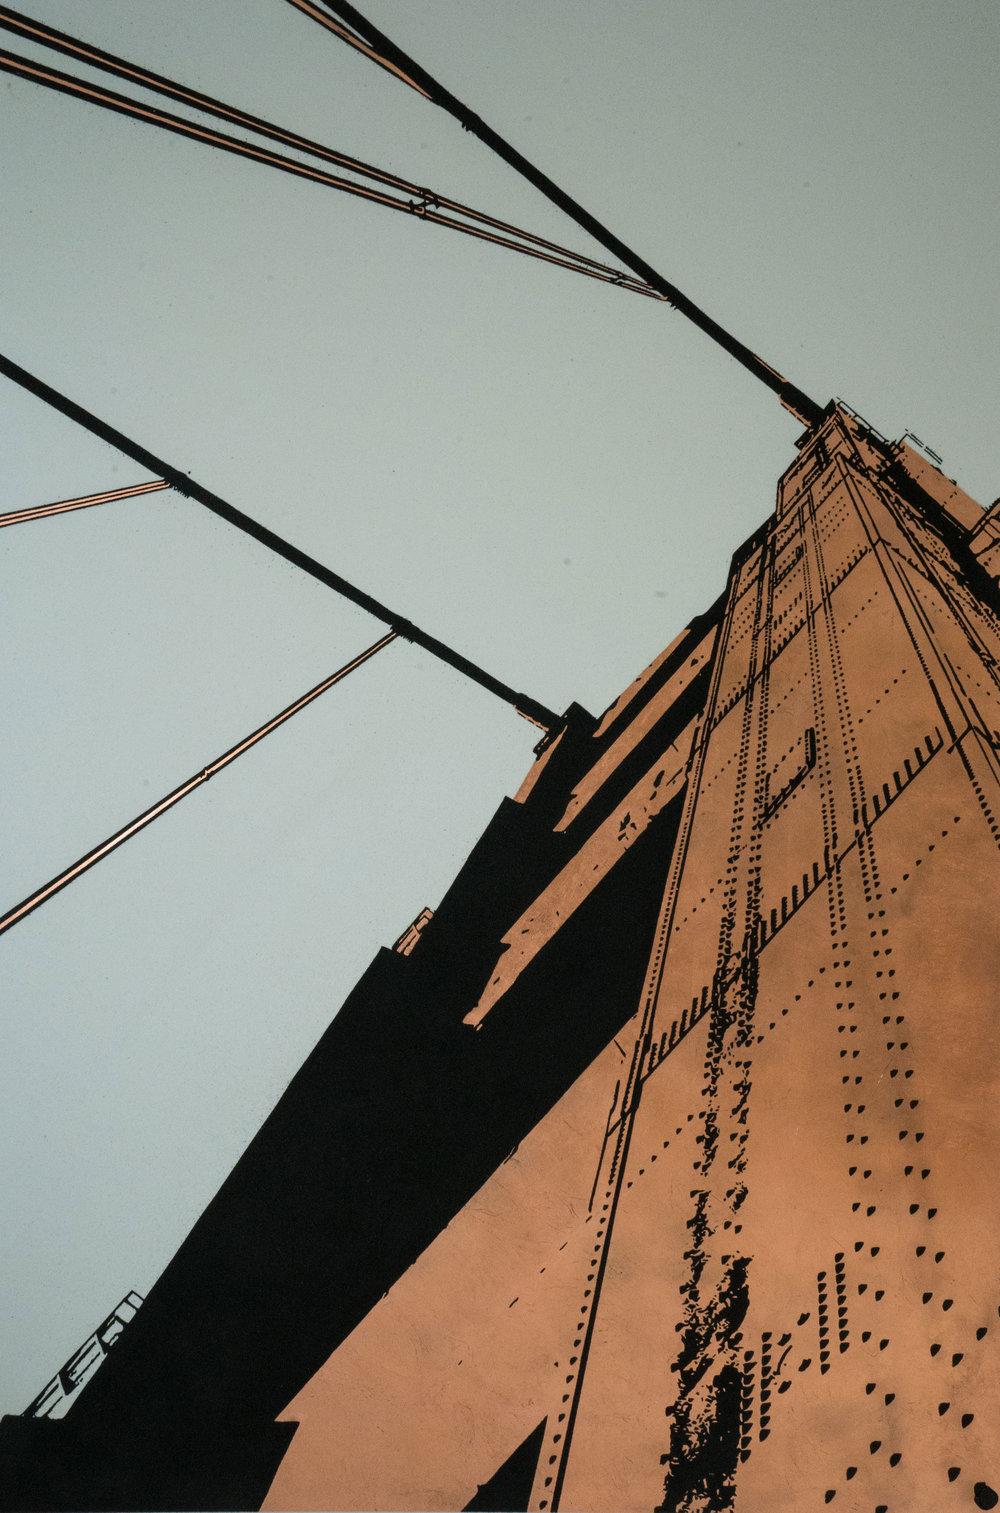 Tim Bengel,  Golden Gate Bridge , 2017, Black Sand, White Sand, Copper, Adhesive, Varnish on Aluminium Panel 79.53h x 53.15w in, Courtesy HG Contemporary